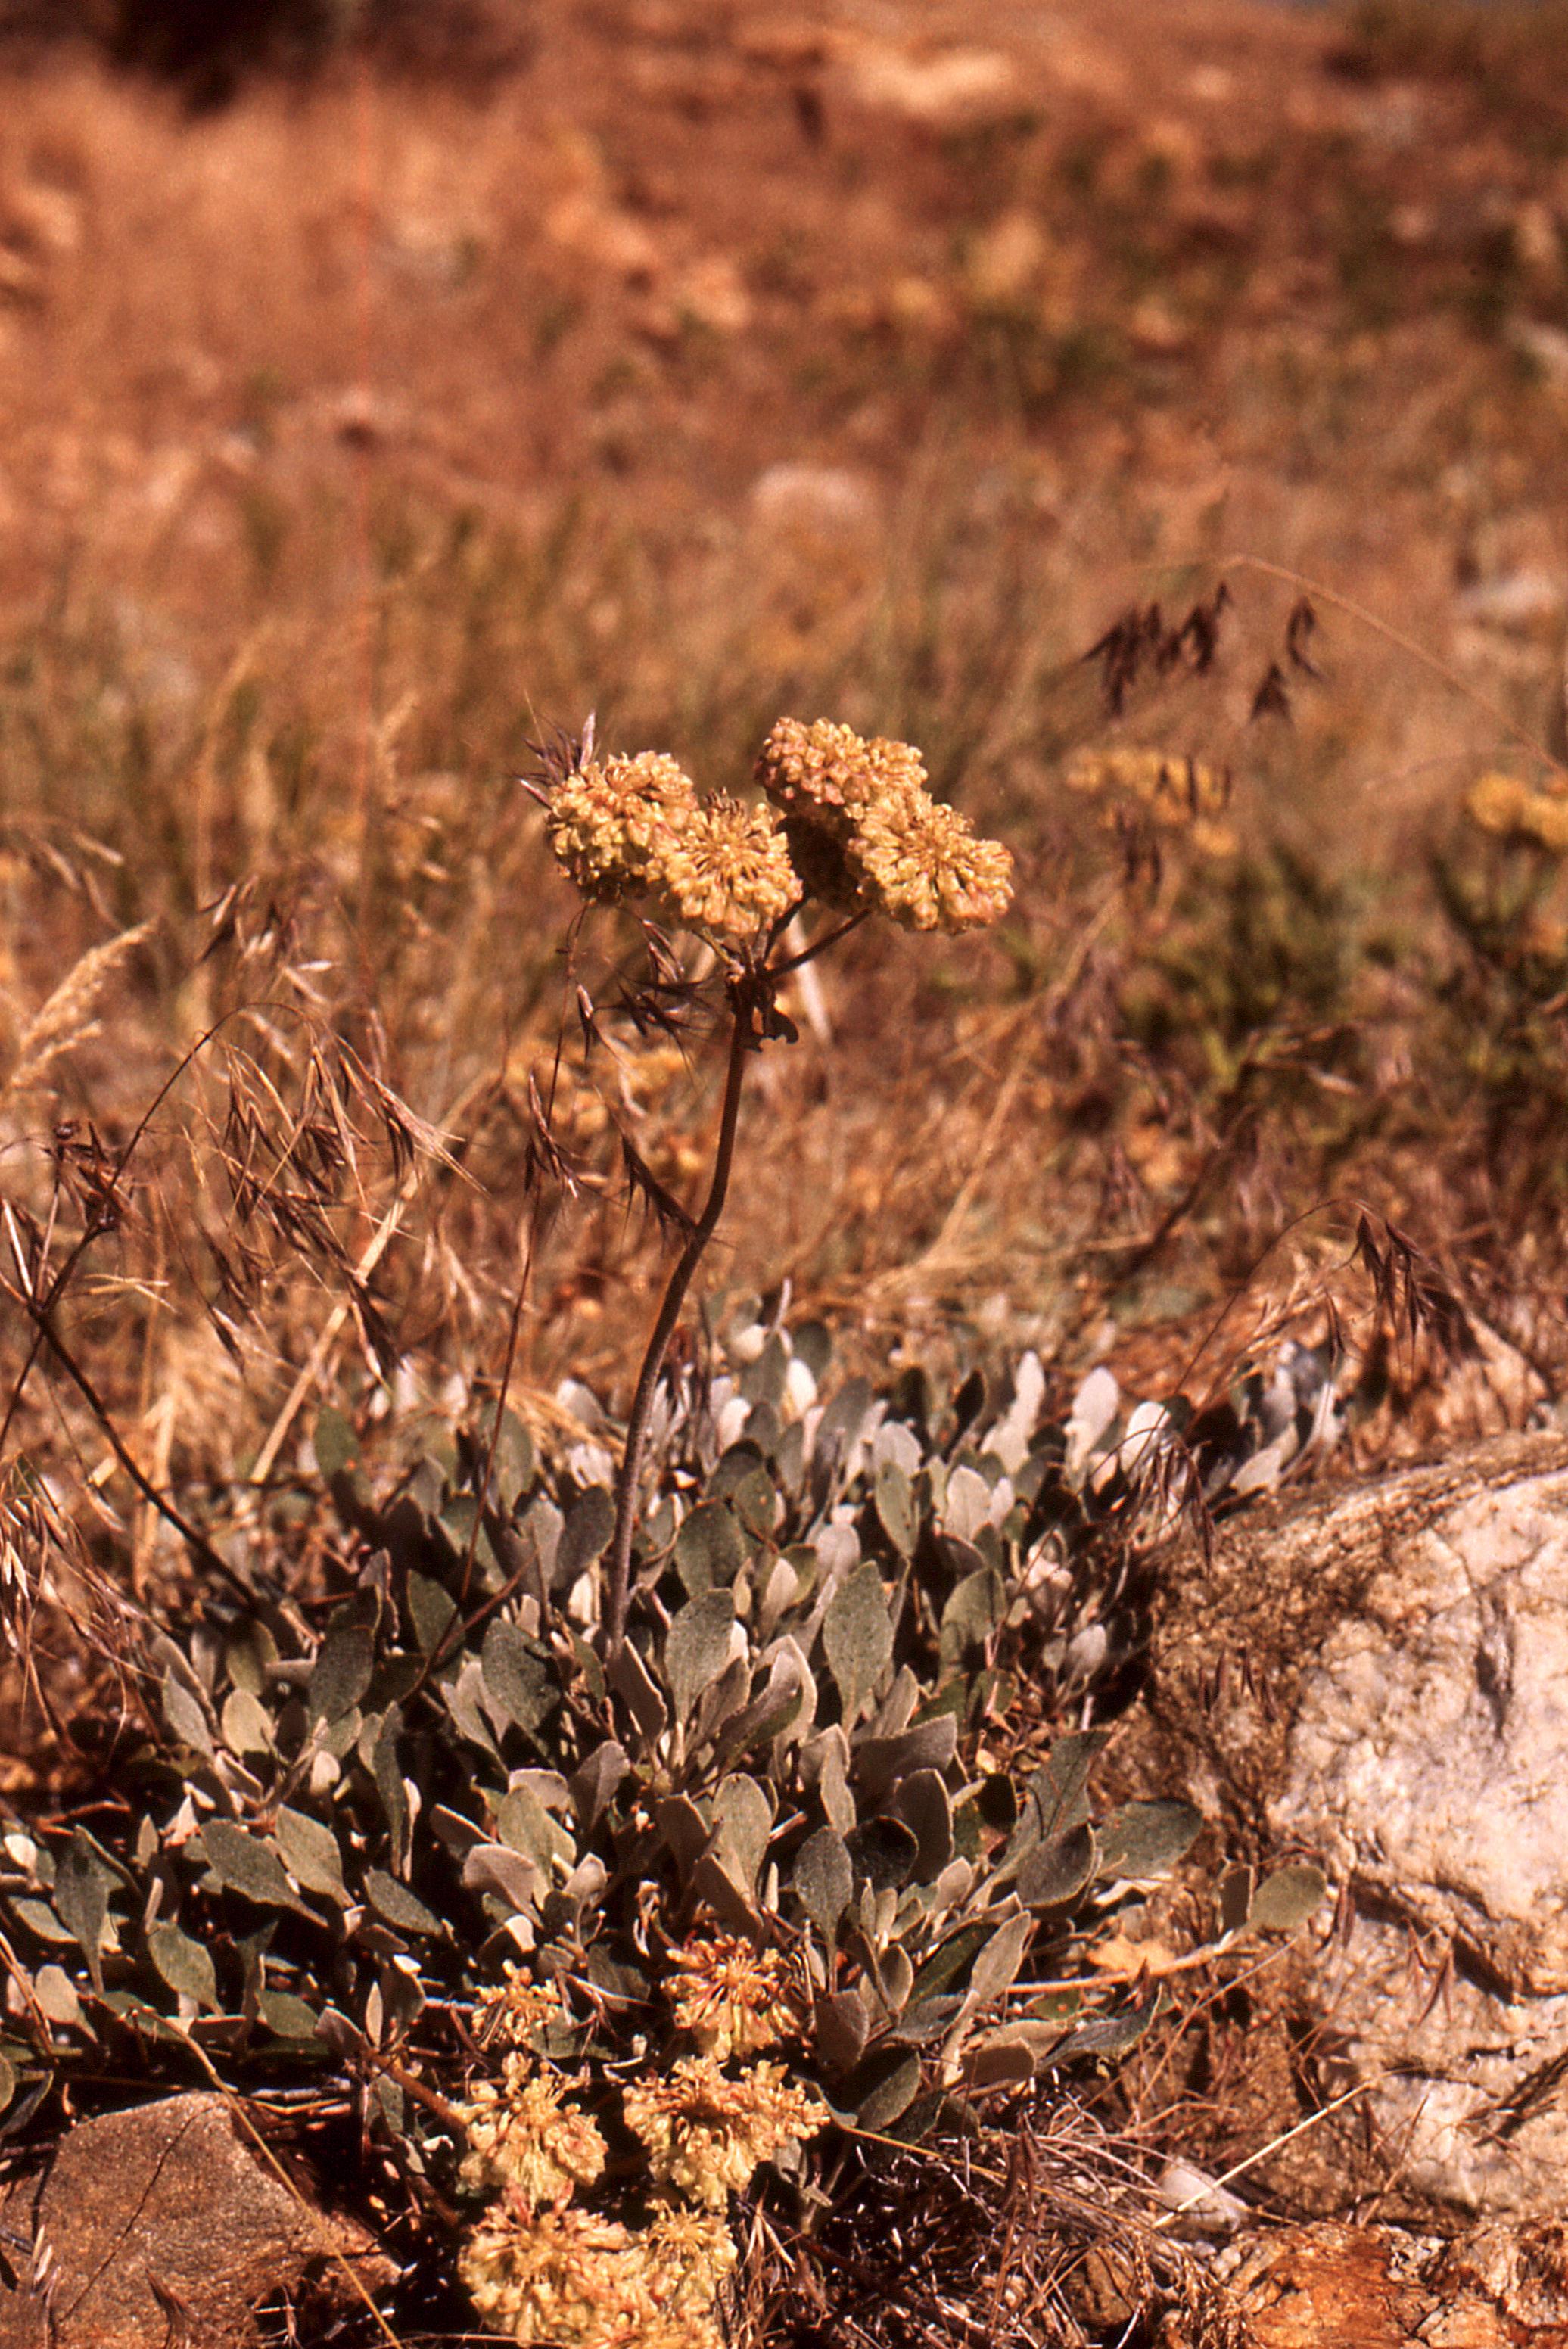 Image of sulphur-flower buckwheat